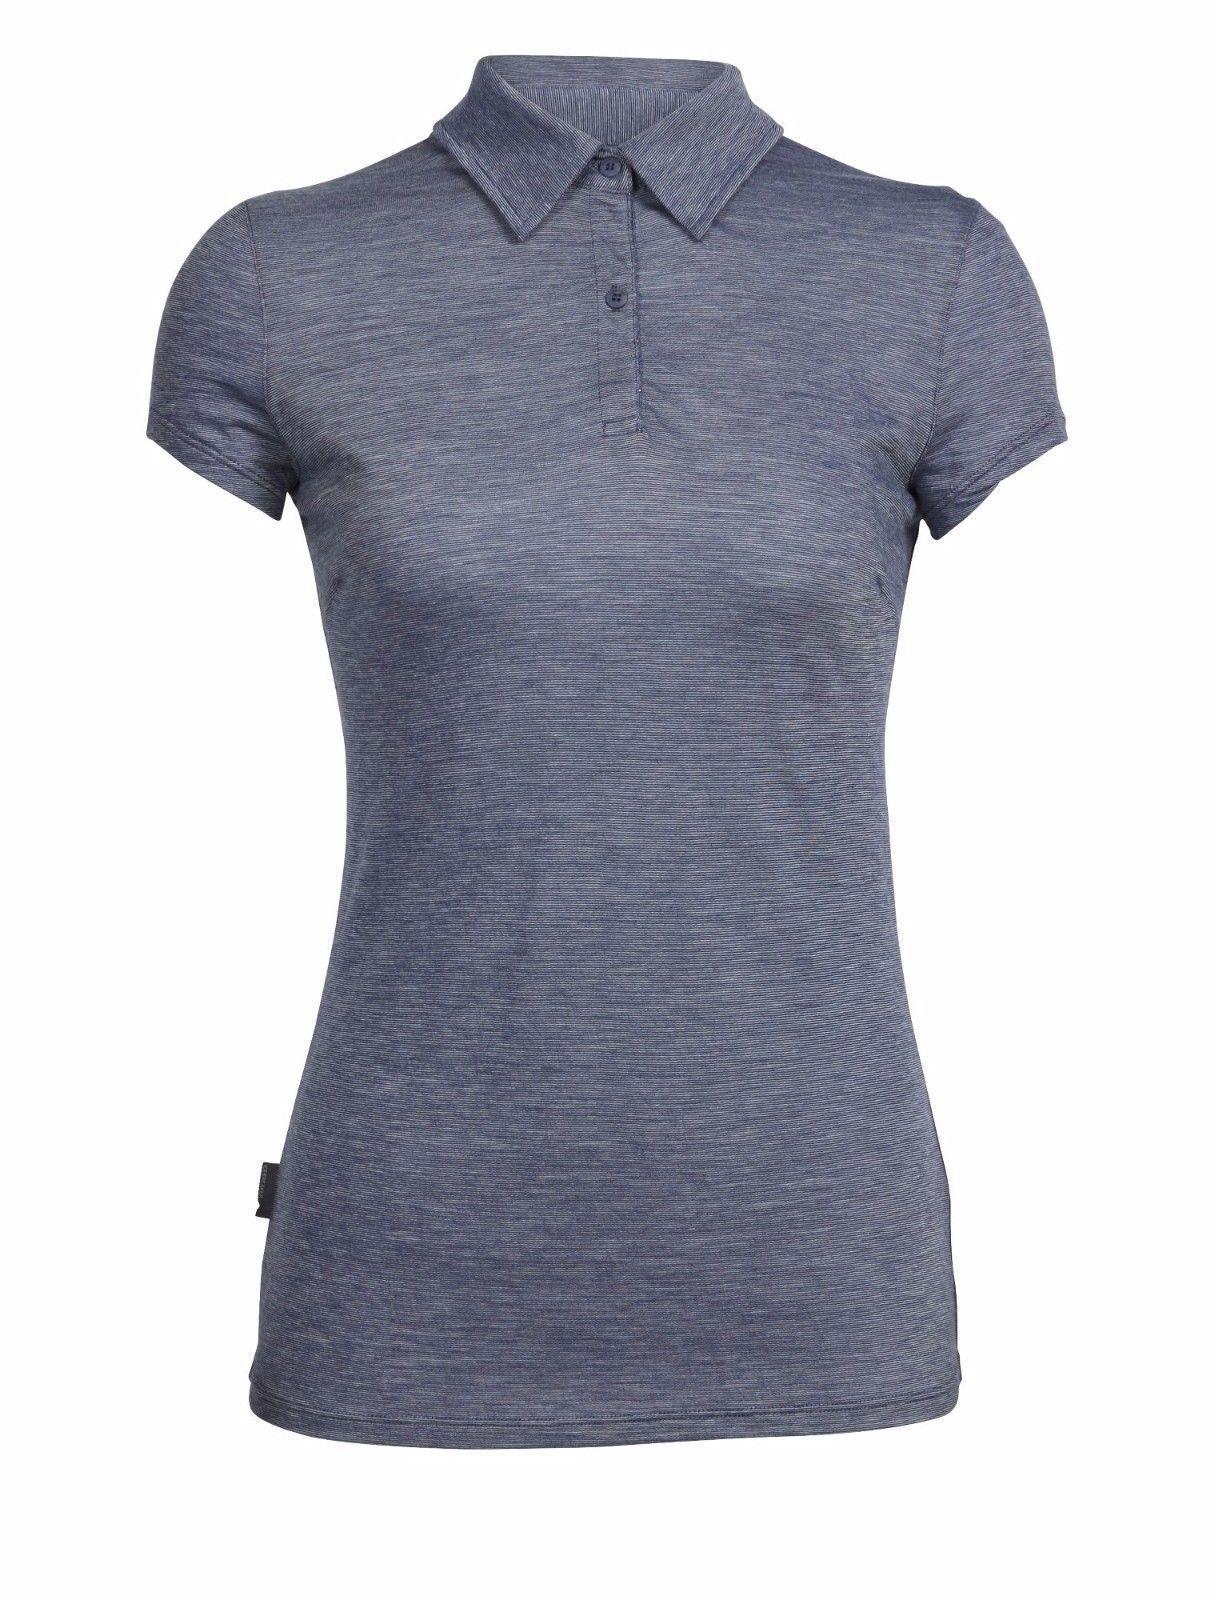 Icebreaker Cool-Lite Sphere Short Sleeve Polo Stripes Damen Damen Damen Shirt Merino Wolle cde8a1